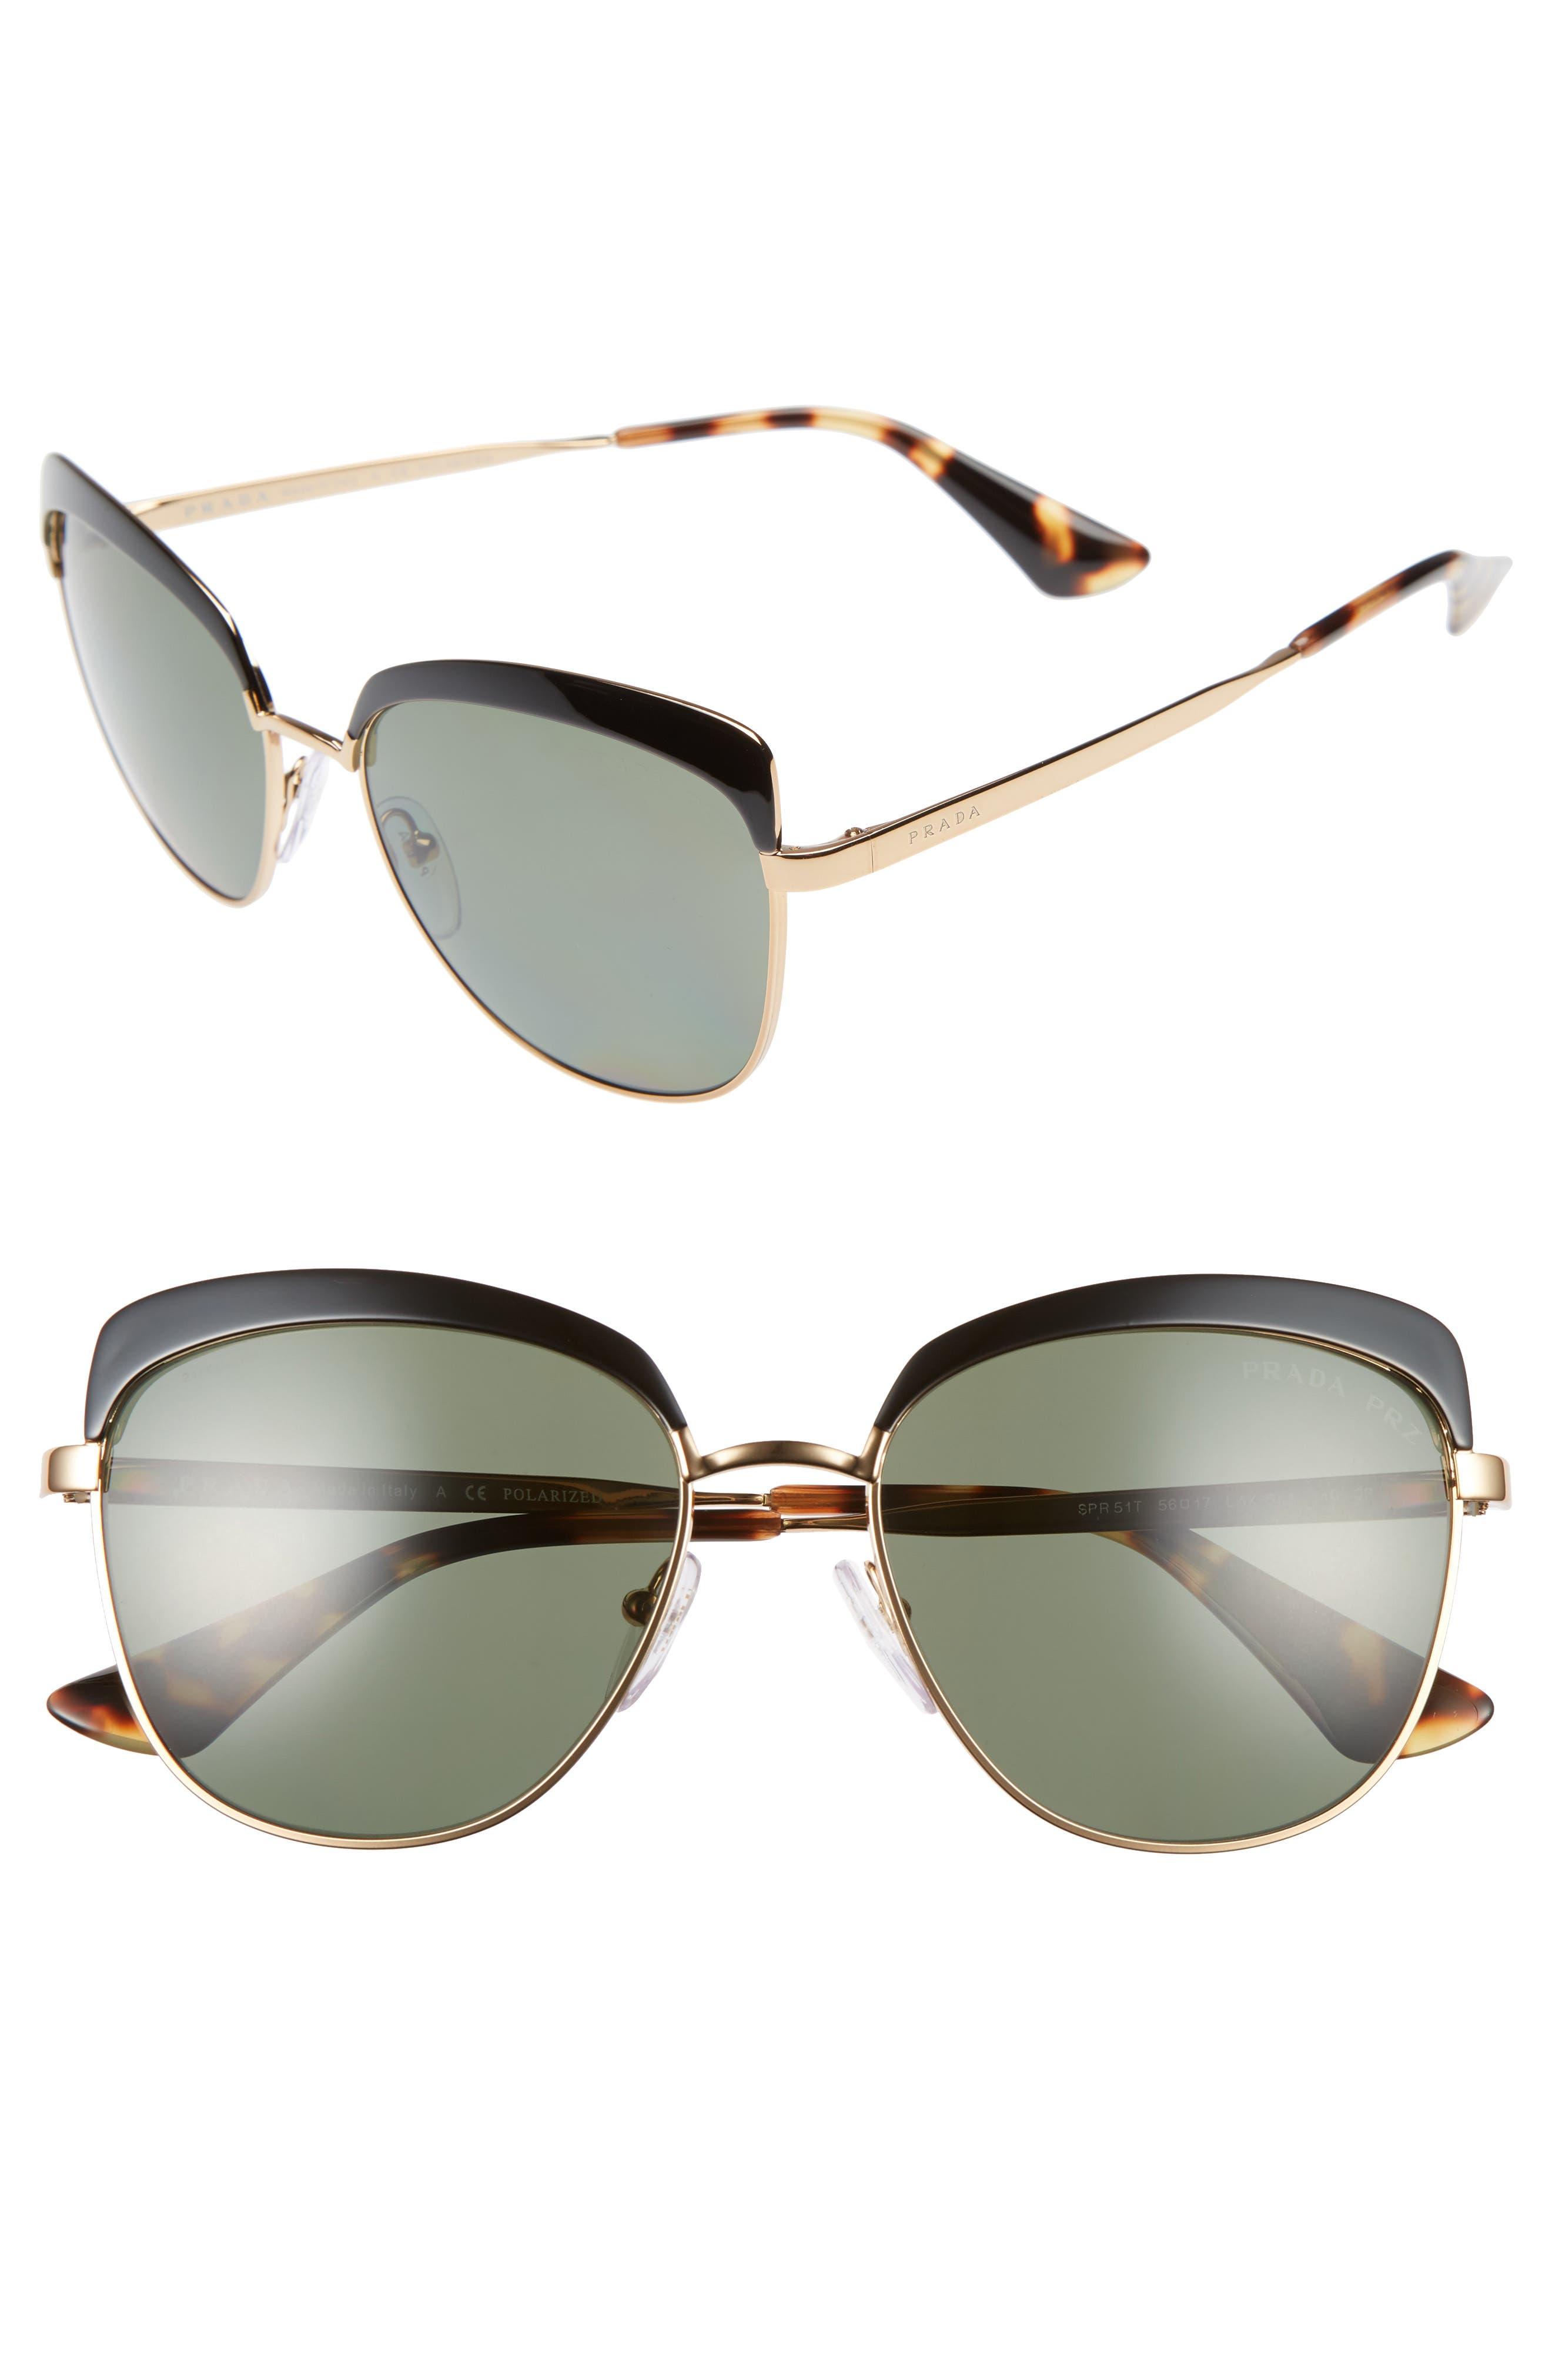 Main Image - Prada 56mm Polarized Sunglasses